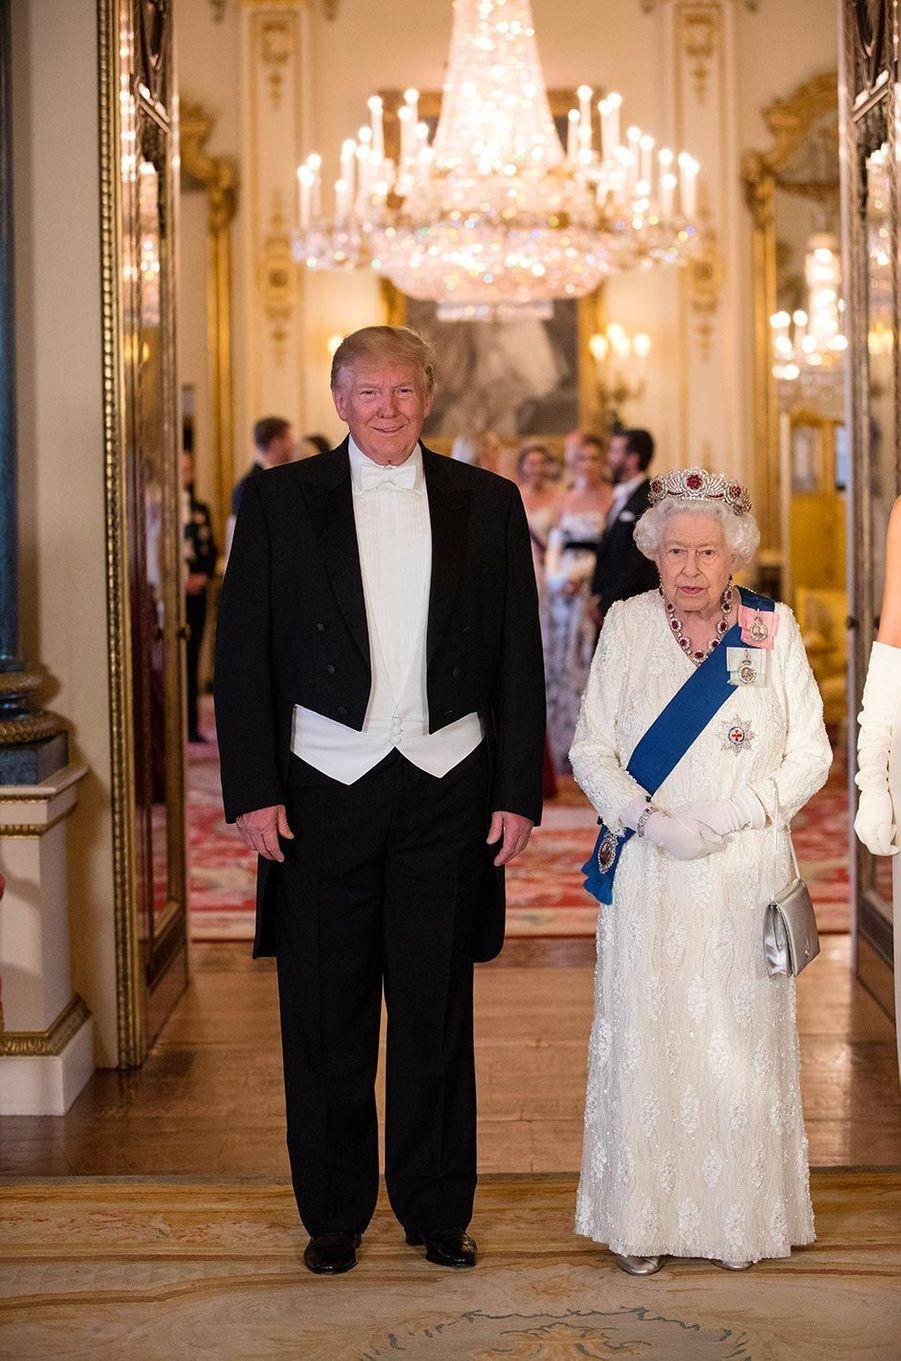 Donald Trump avec la reine Elizabeth II à Buckingham Palace, le 3 juin 2019.